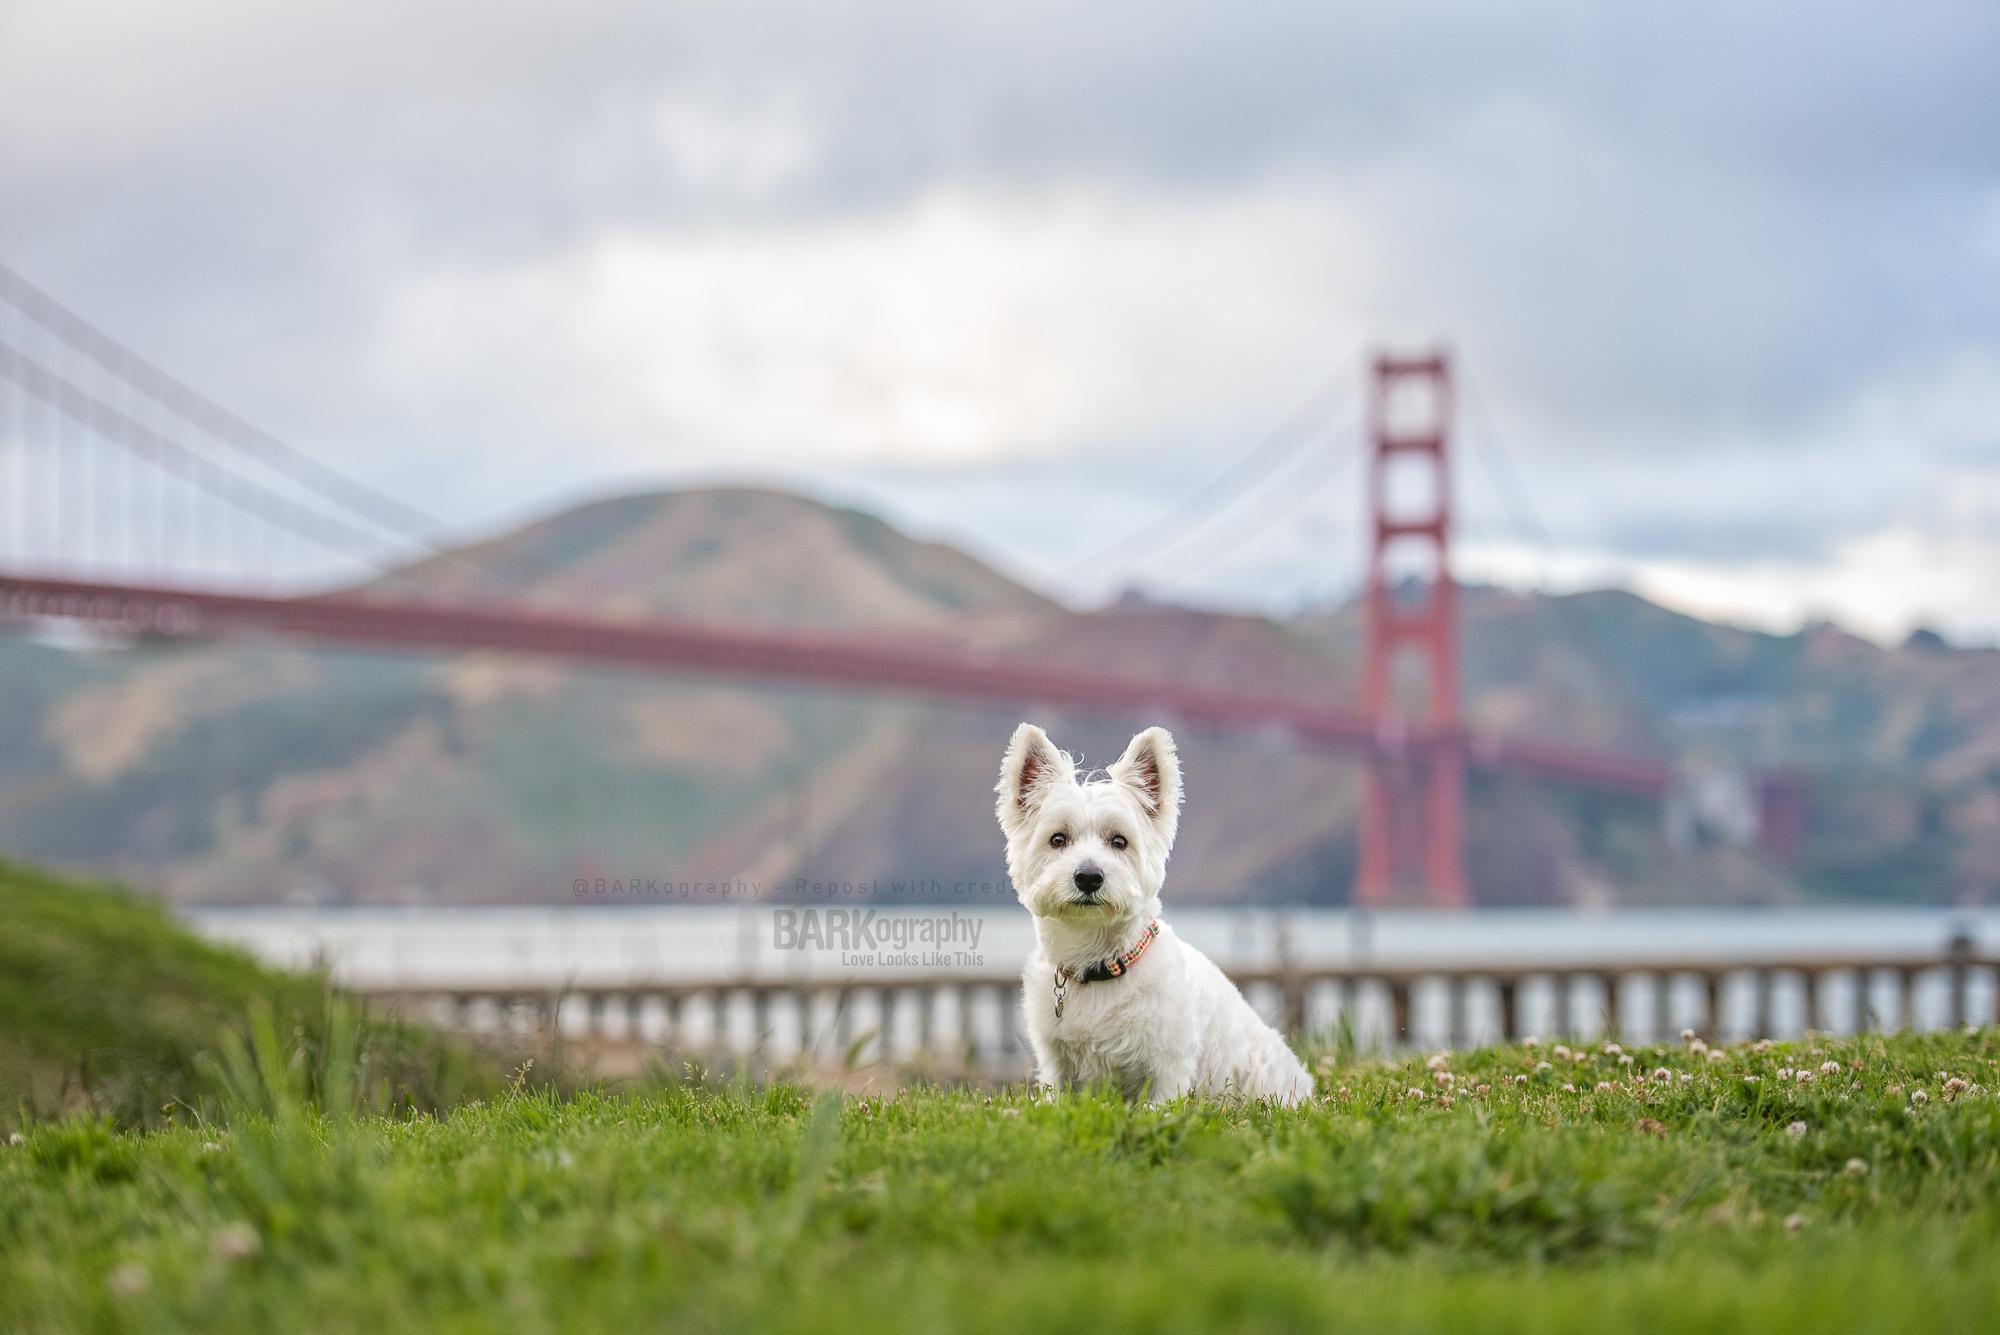 San Francisco Crissy Field Golden Gate Bridge dog picture